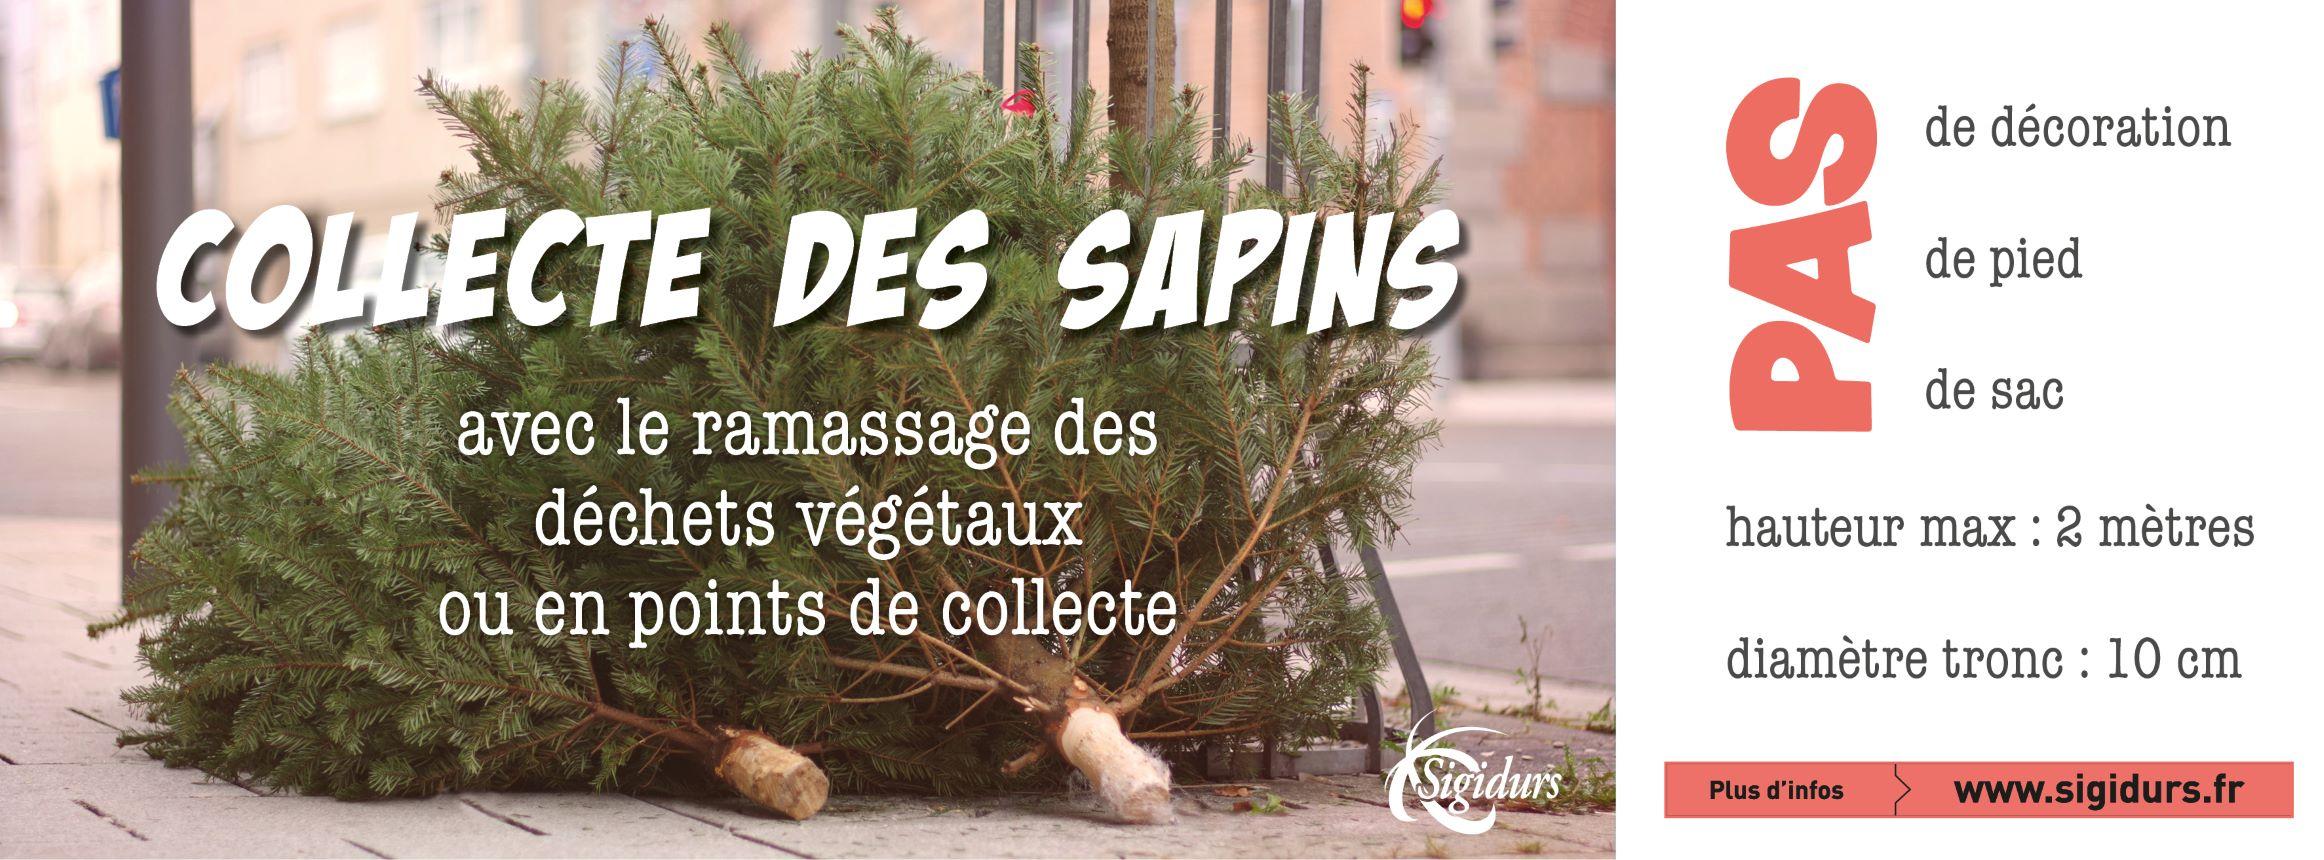 bandeau_collecte_sapin_bd.jpg